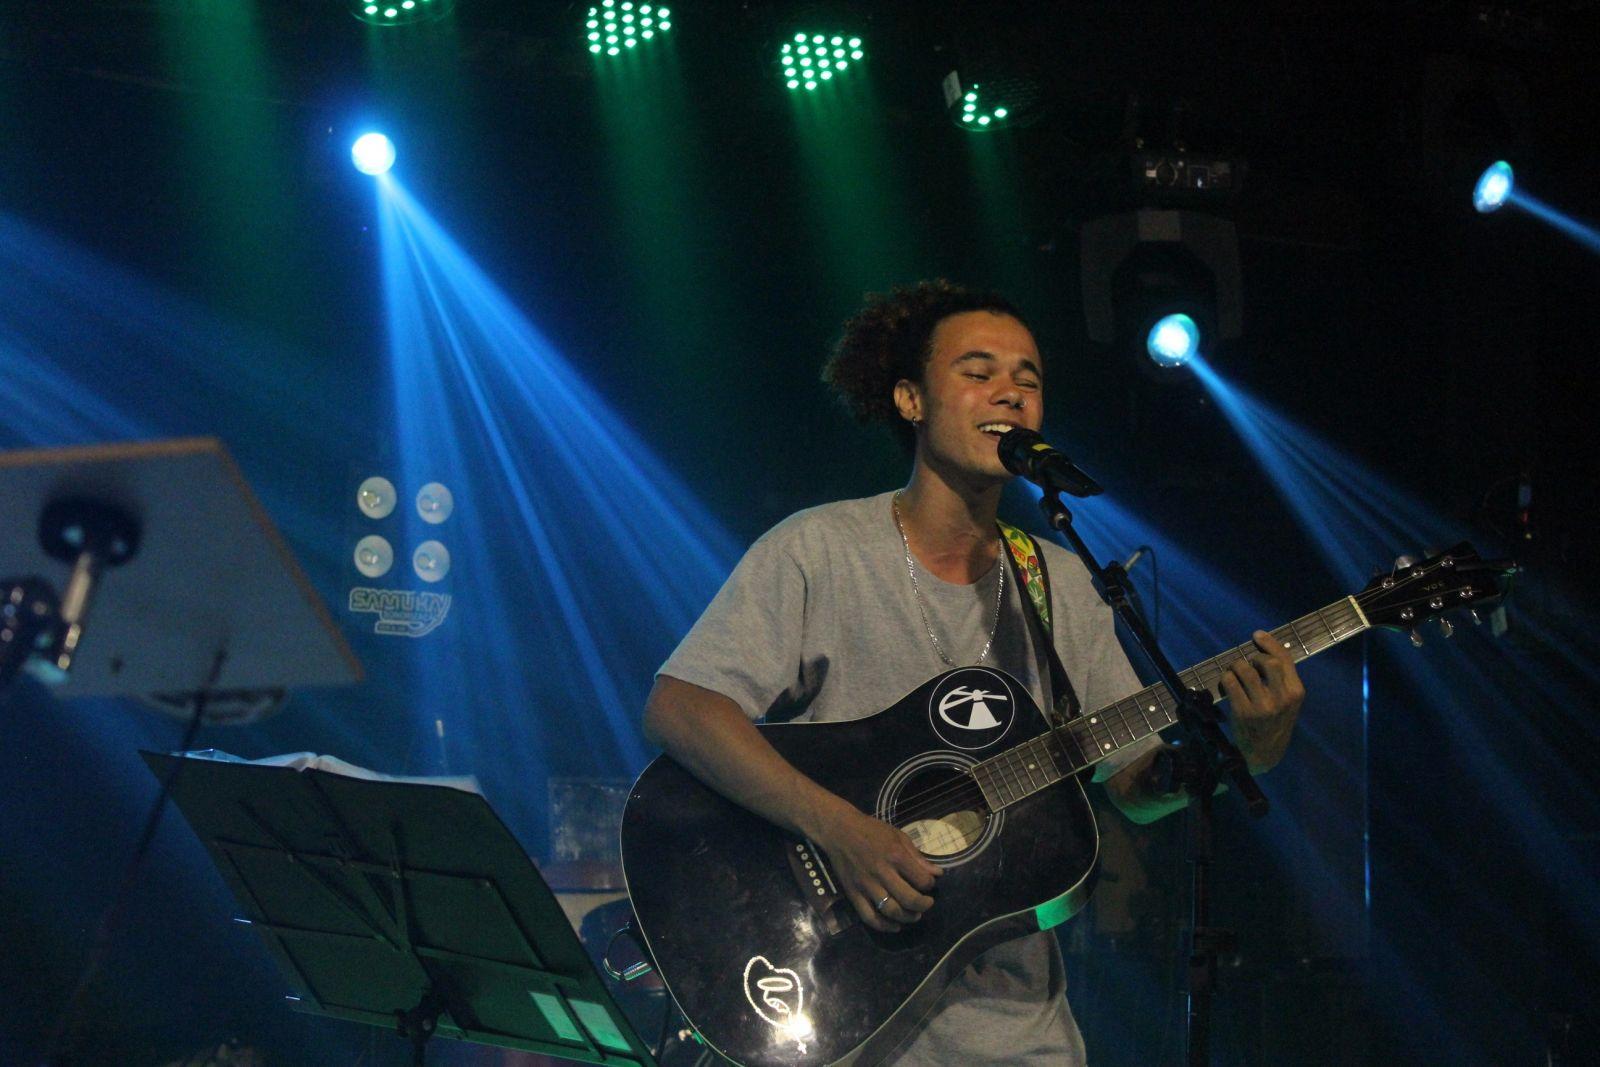 Guilmer está iniciando a carreira musical. Foto: Jean Carlos Nesi